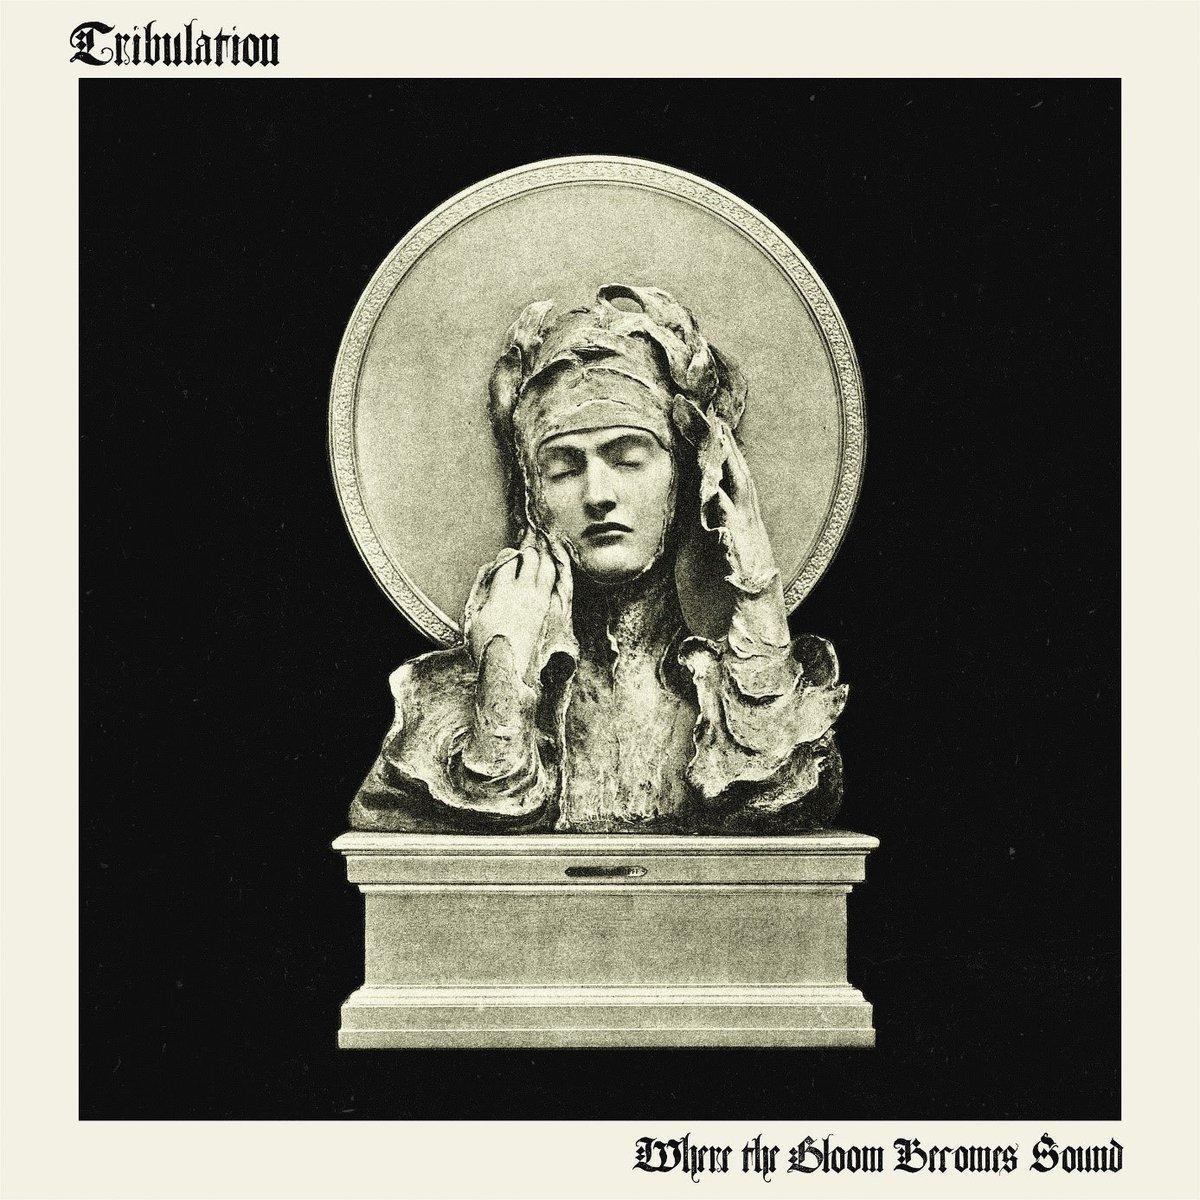 Tribulation Announces New Album 'Where the Gloom Becomes Sound'  #Tribulation #WhereTheGloomBecomesSound